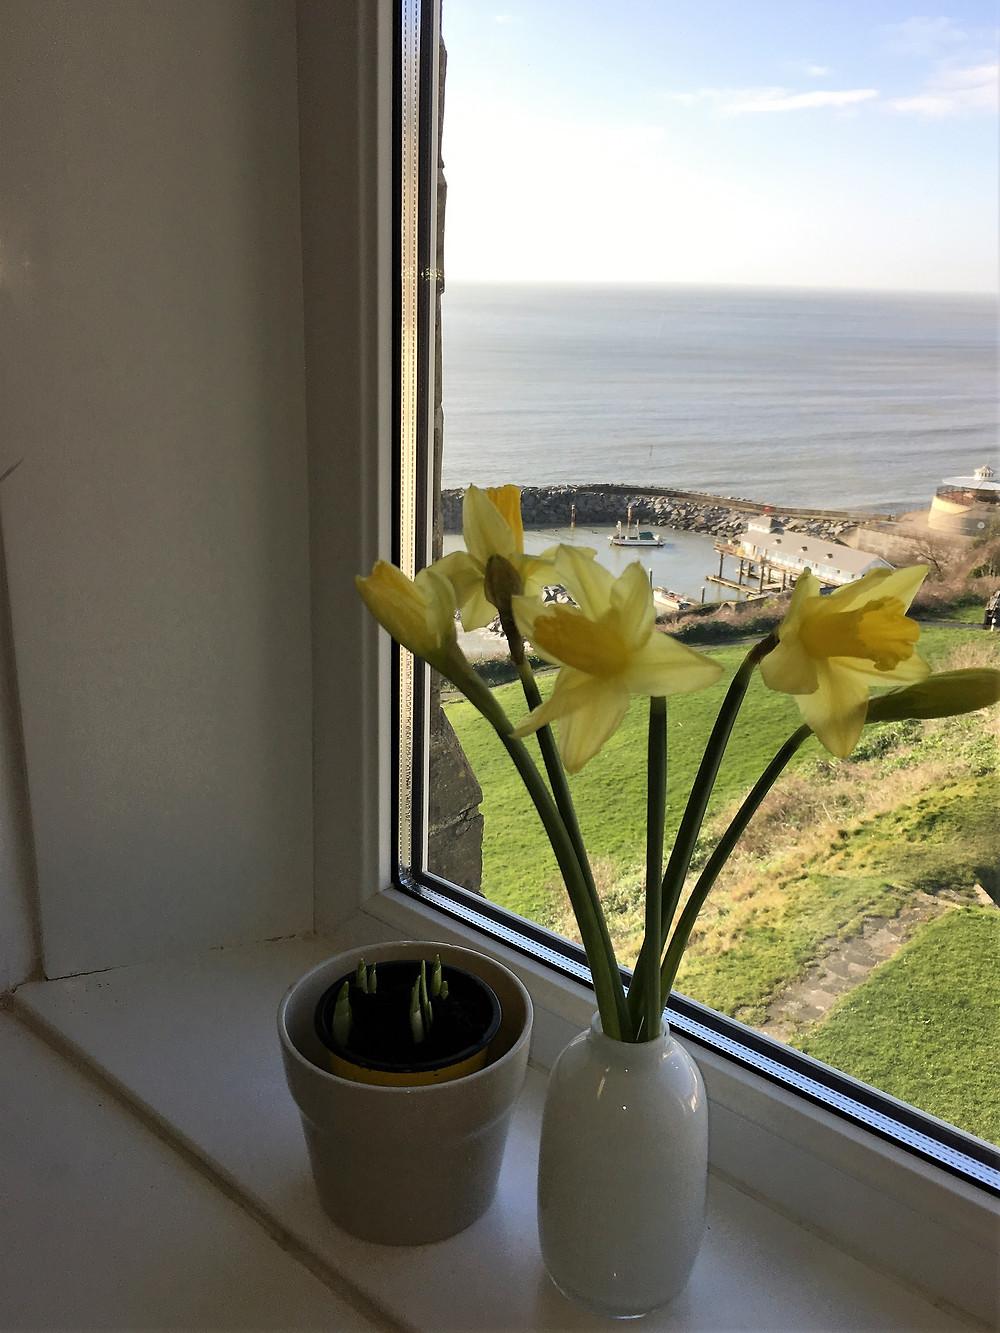 Daffodils overlooking Ventnor Harbour